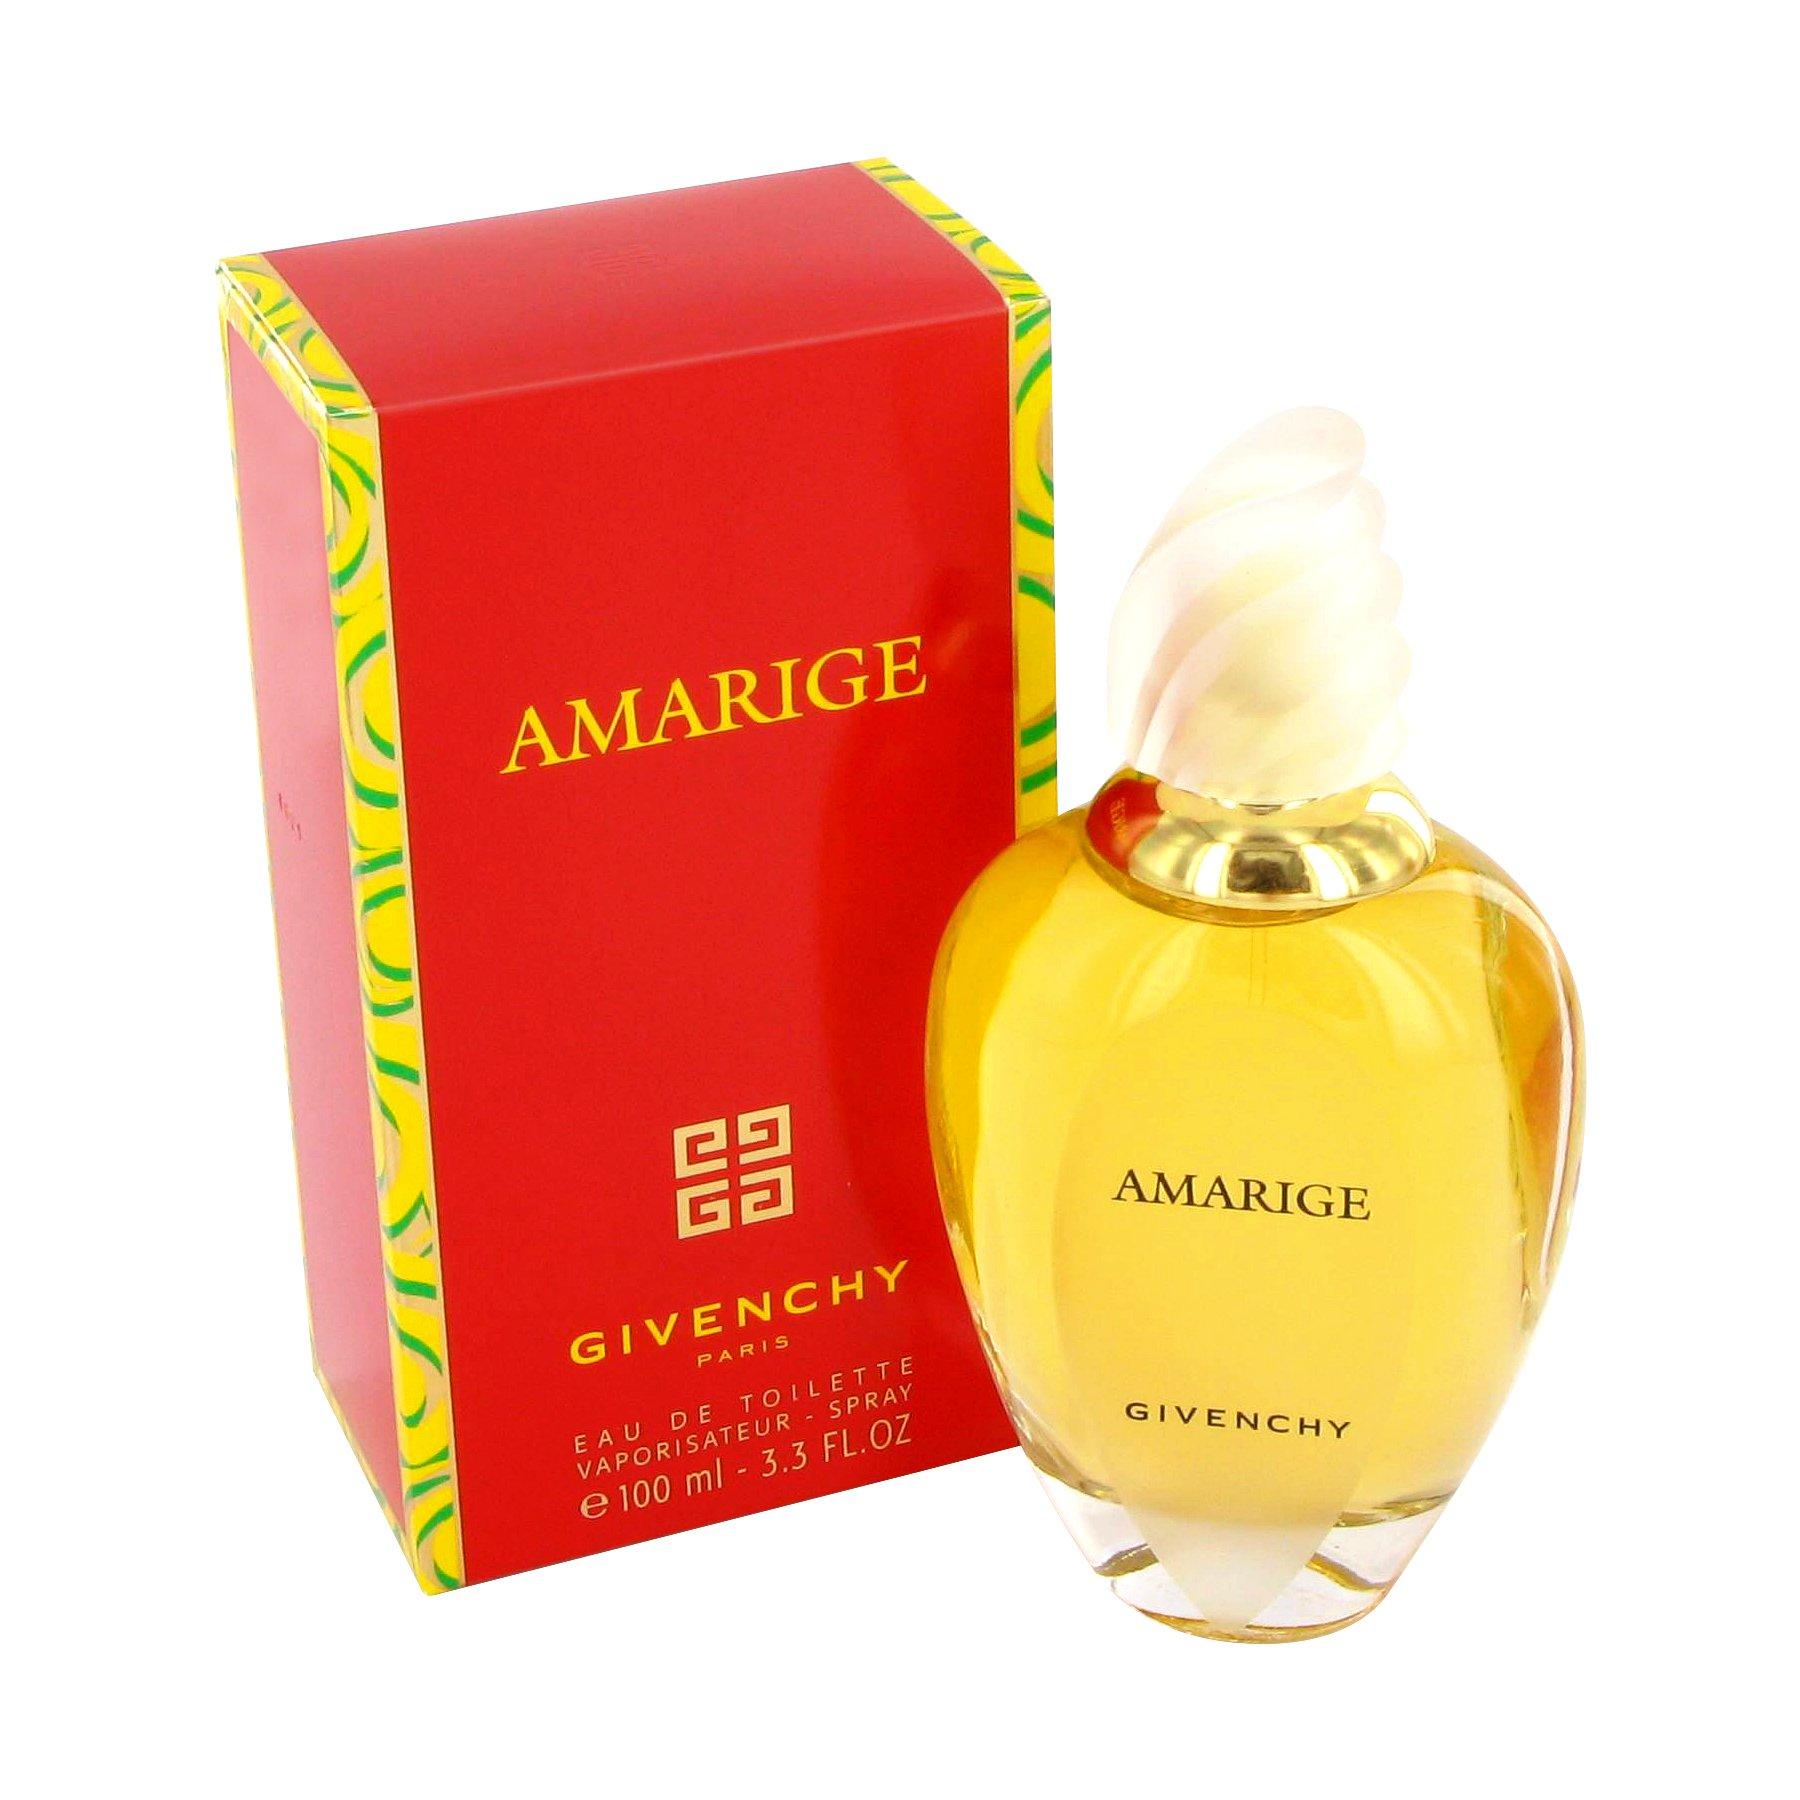 AMARIGE by Givenchy - Eau De Toilette Spray 3.4 oz - Women